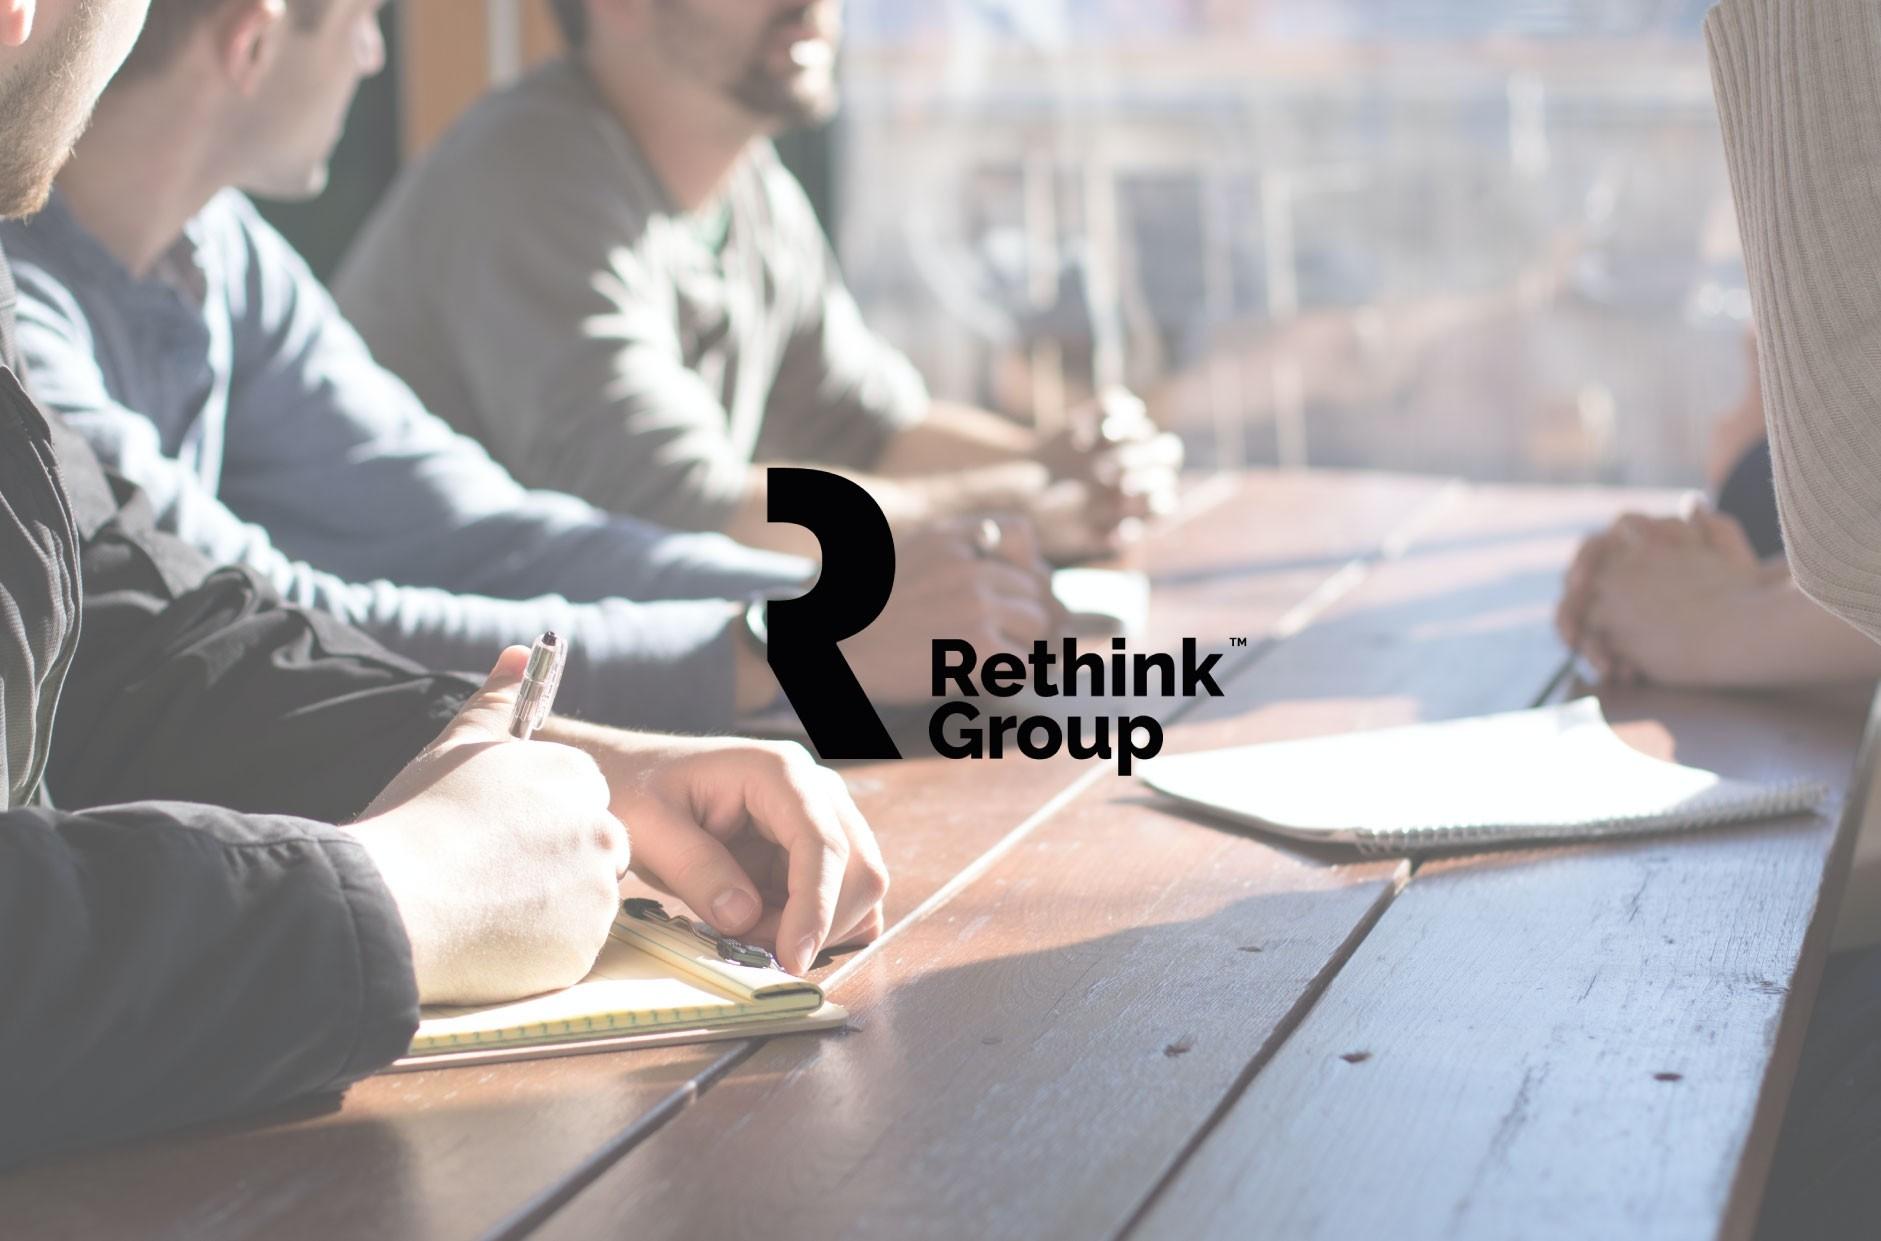 Rethink-Group-SFW-